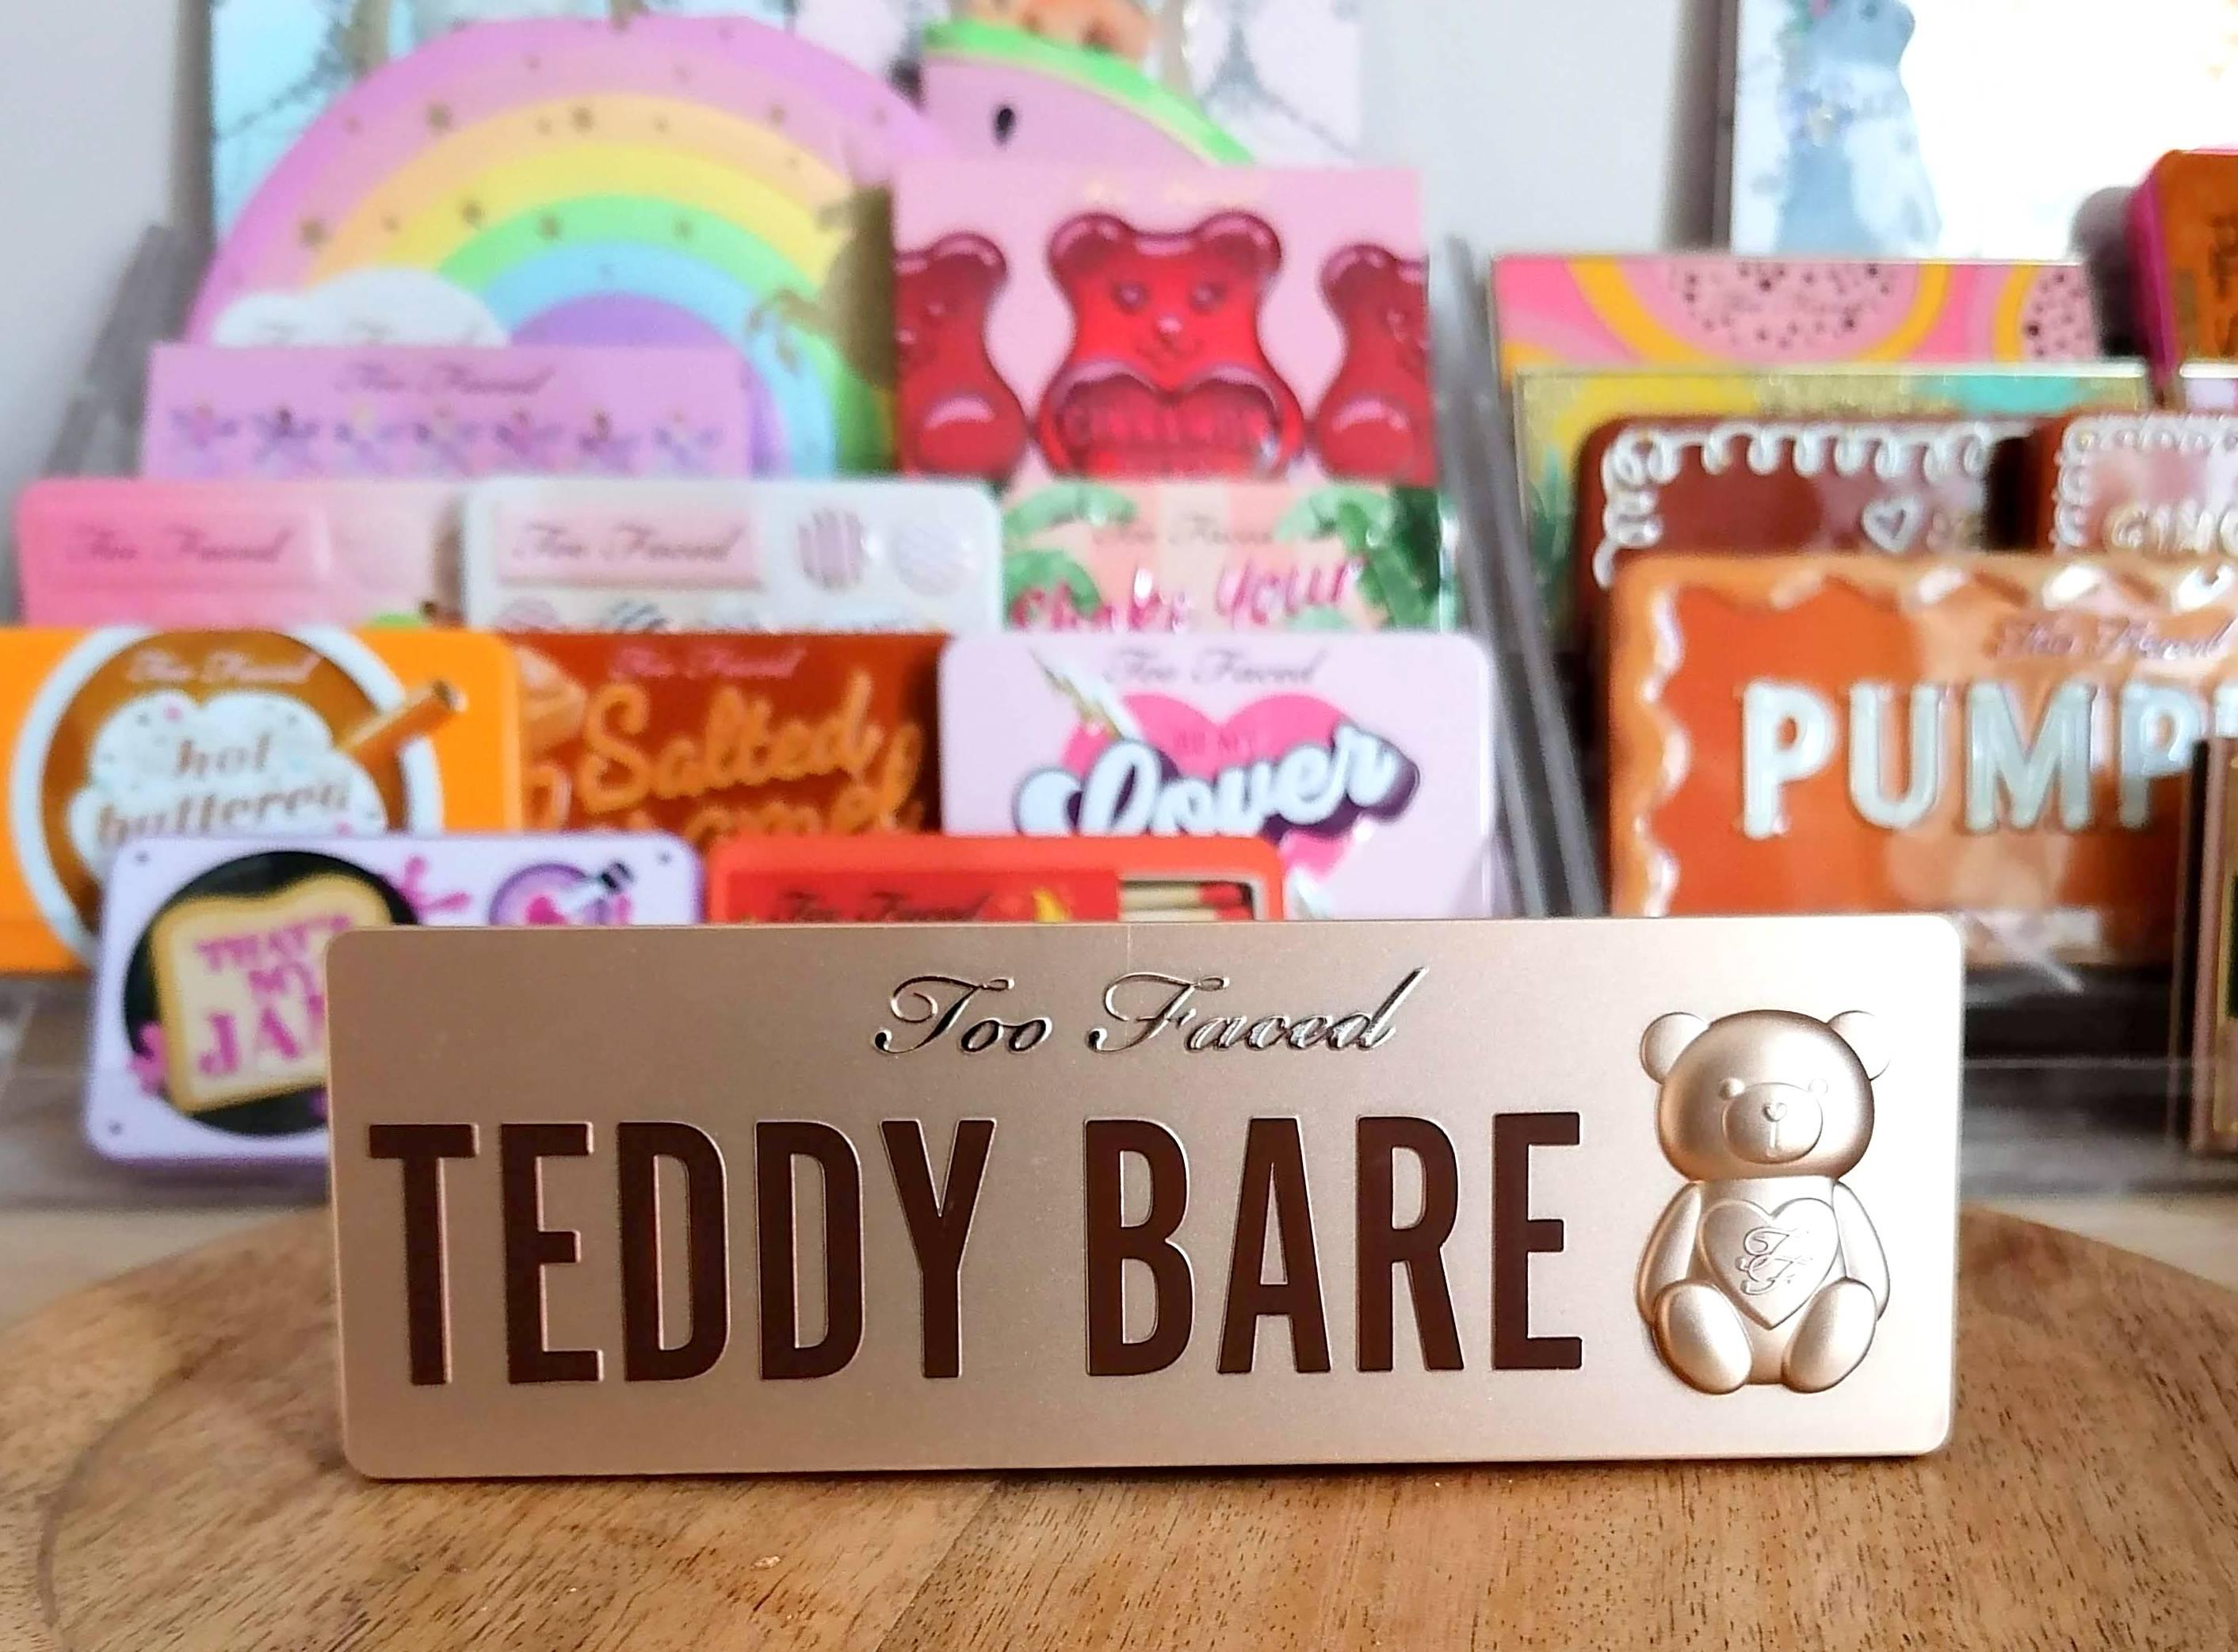 Teddy Bare  🧸 TOO FACED